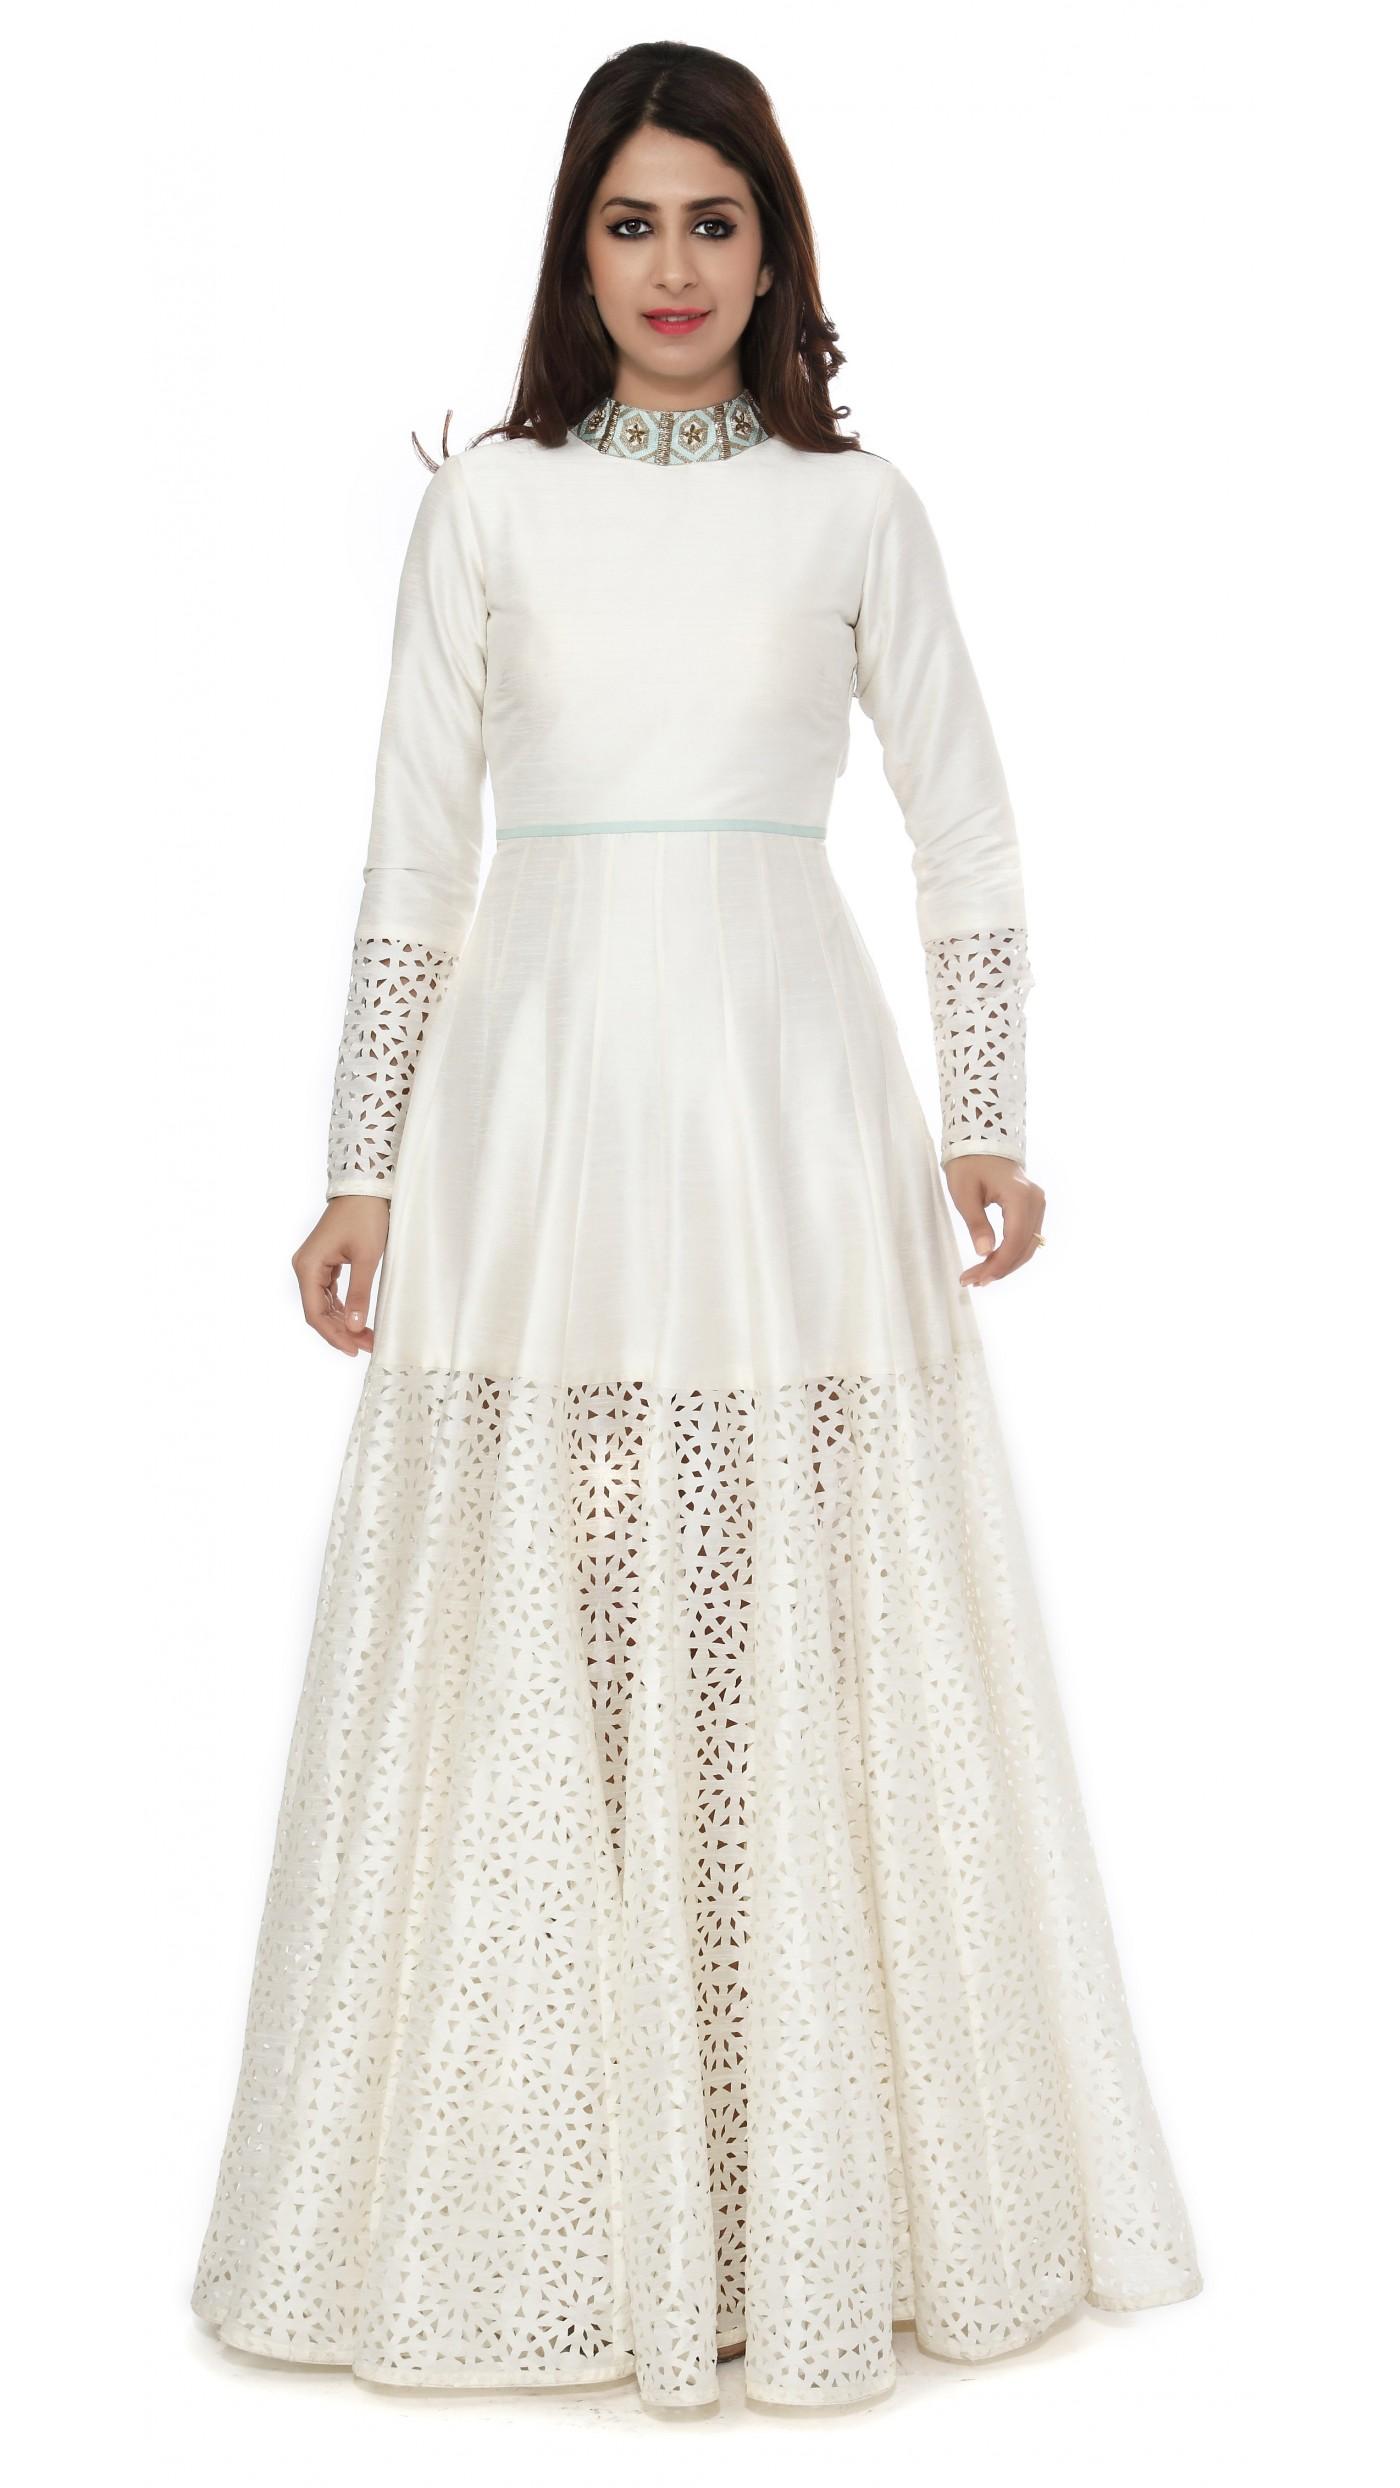 SVA by Sonam & Paras Modi\'s White Raw Silk Cutwork Gown